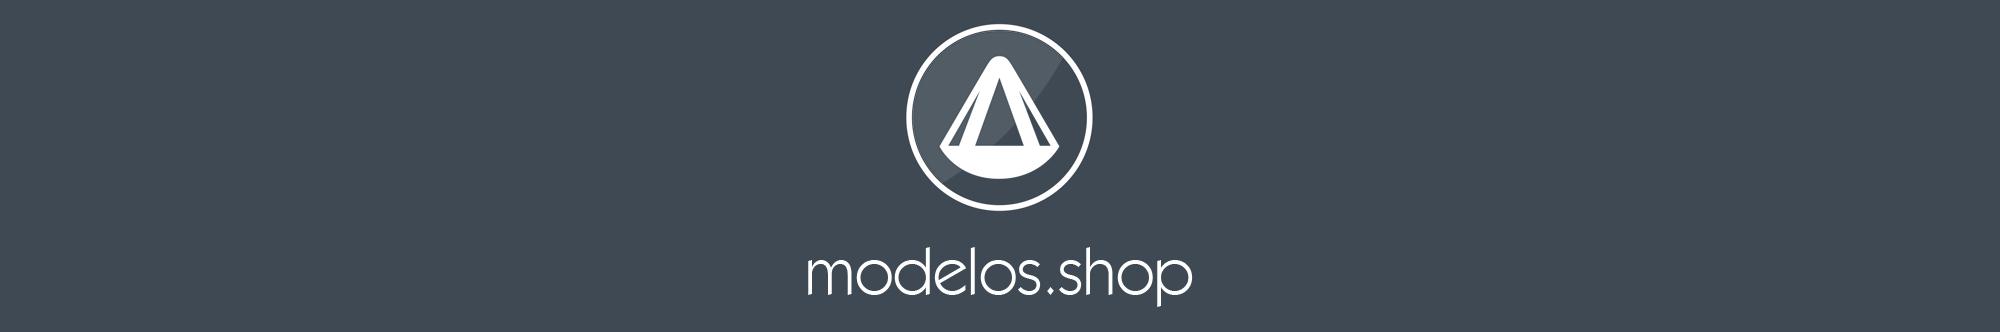 Modelo de Licencia de marca comercial contrato modelos